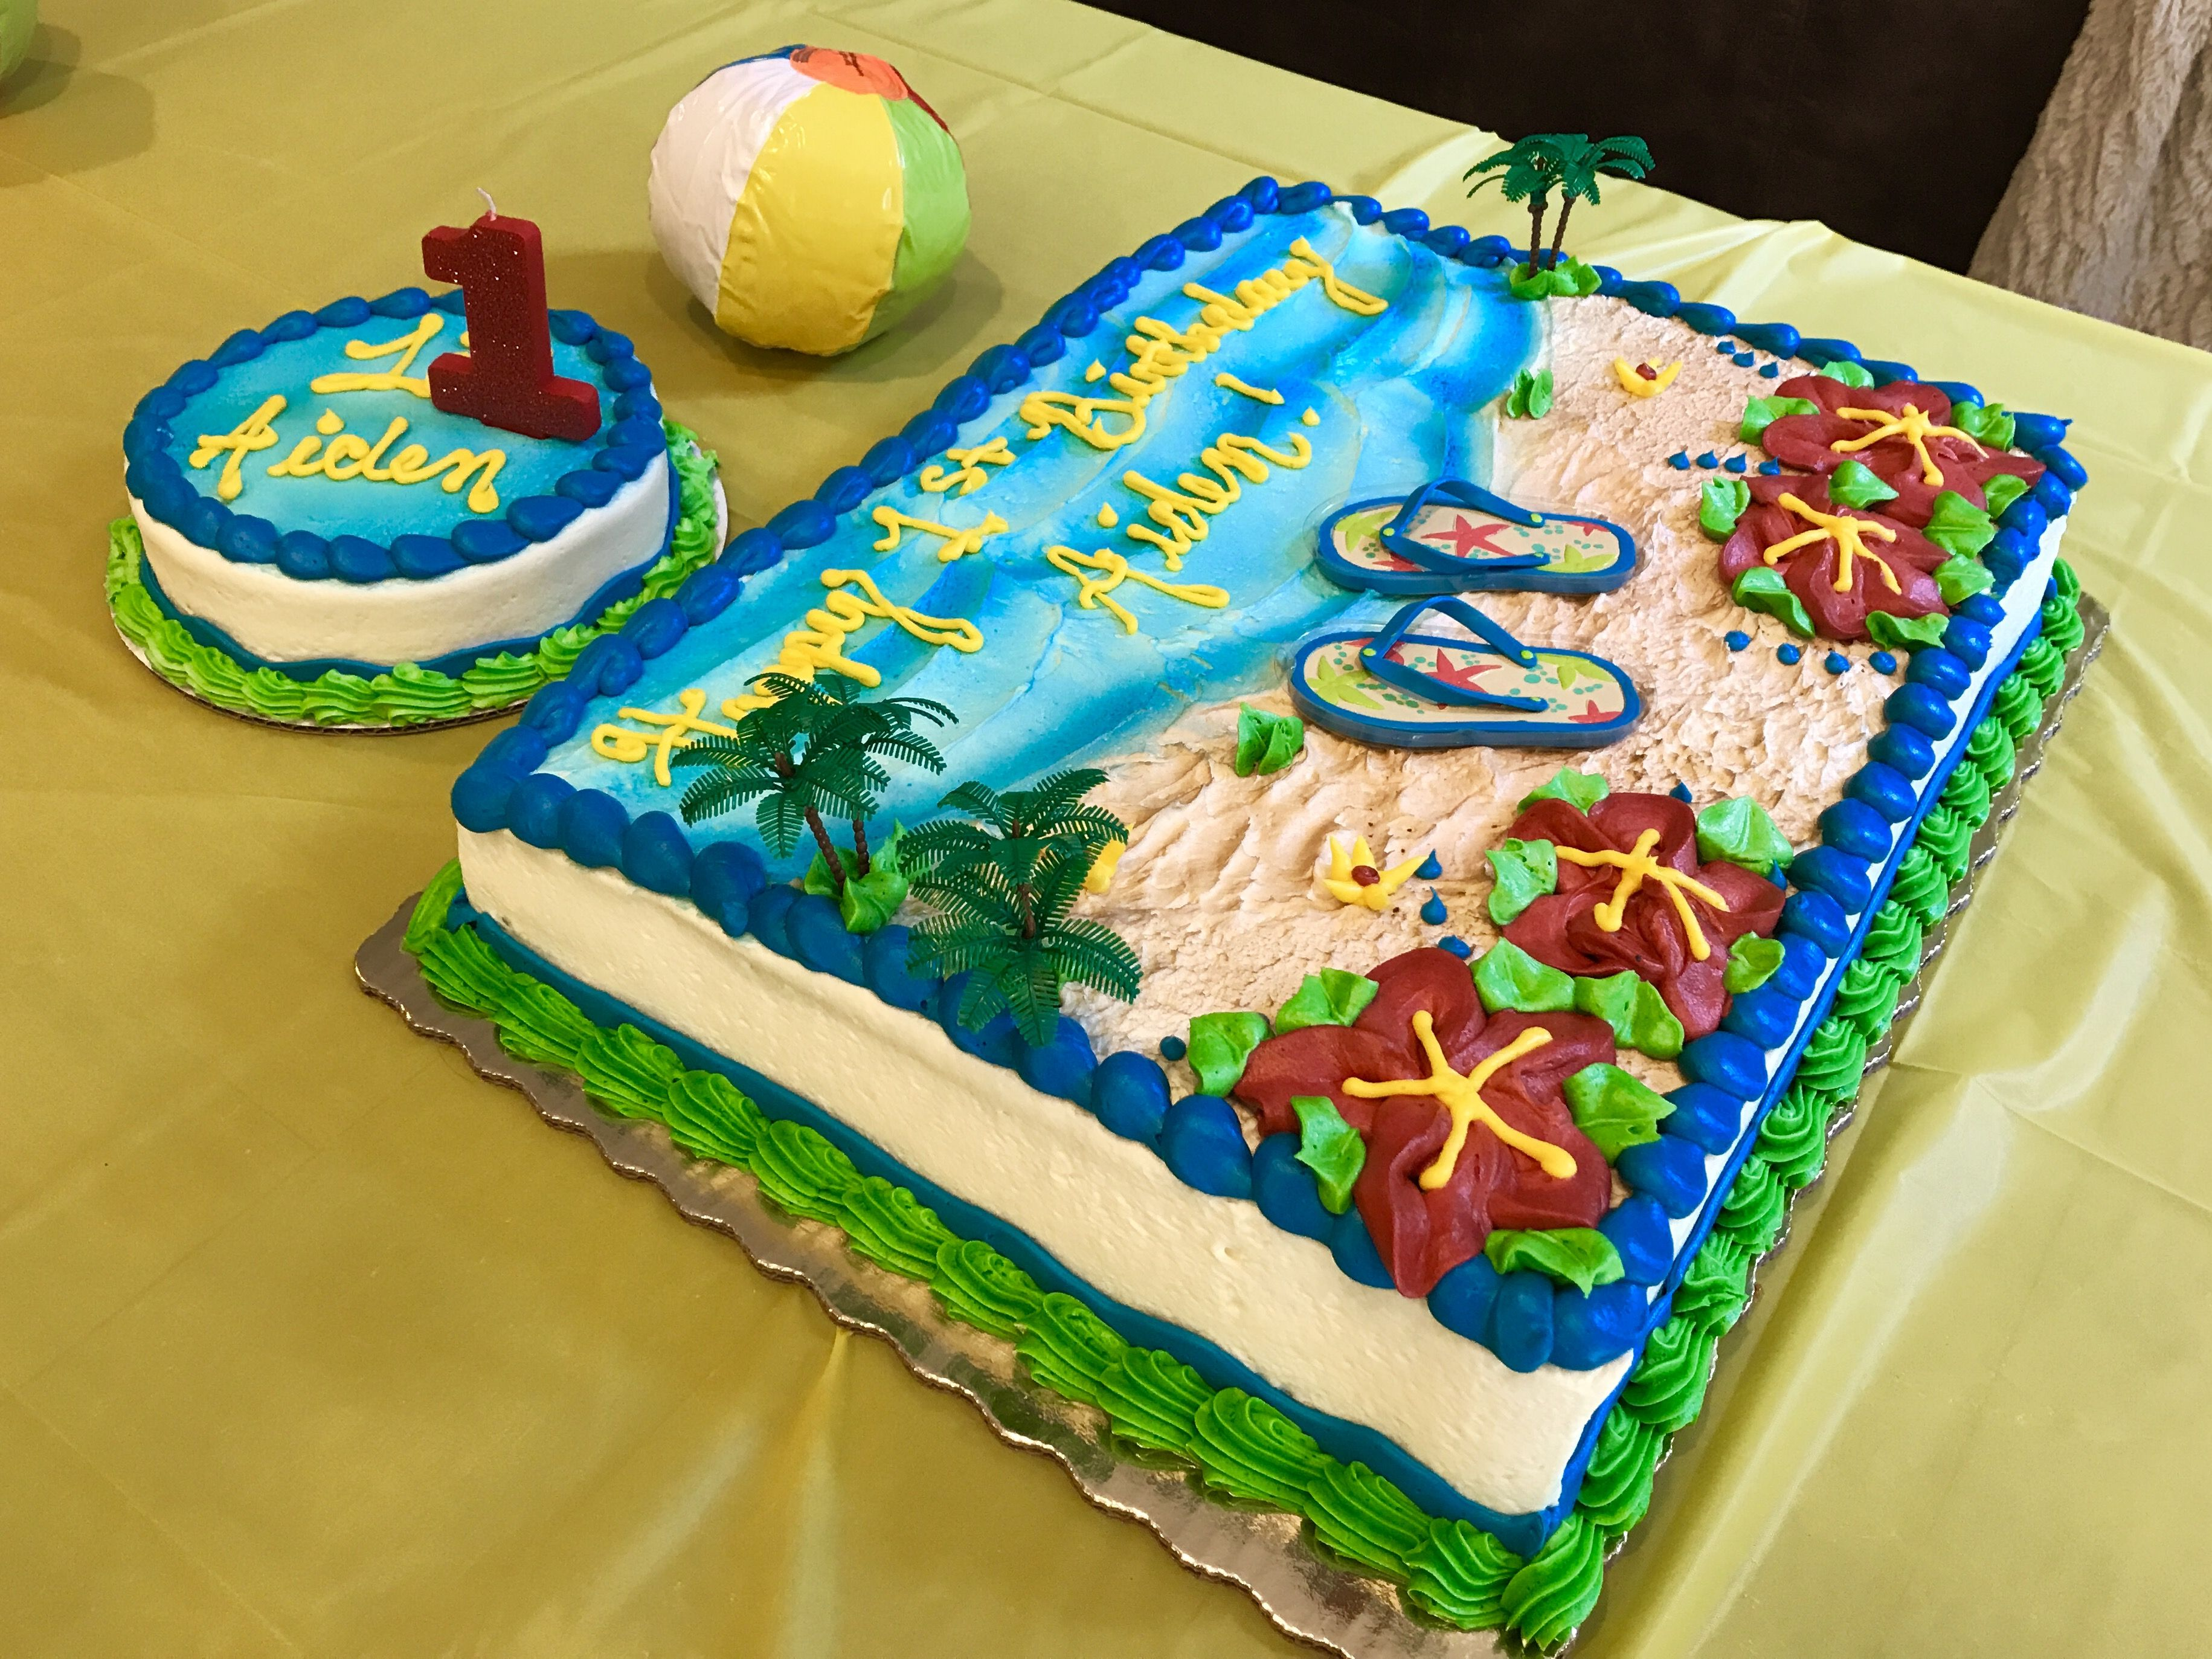 Bakery bakery party cakes sweet desserts